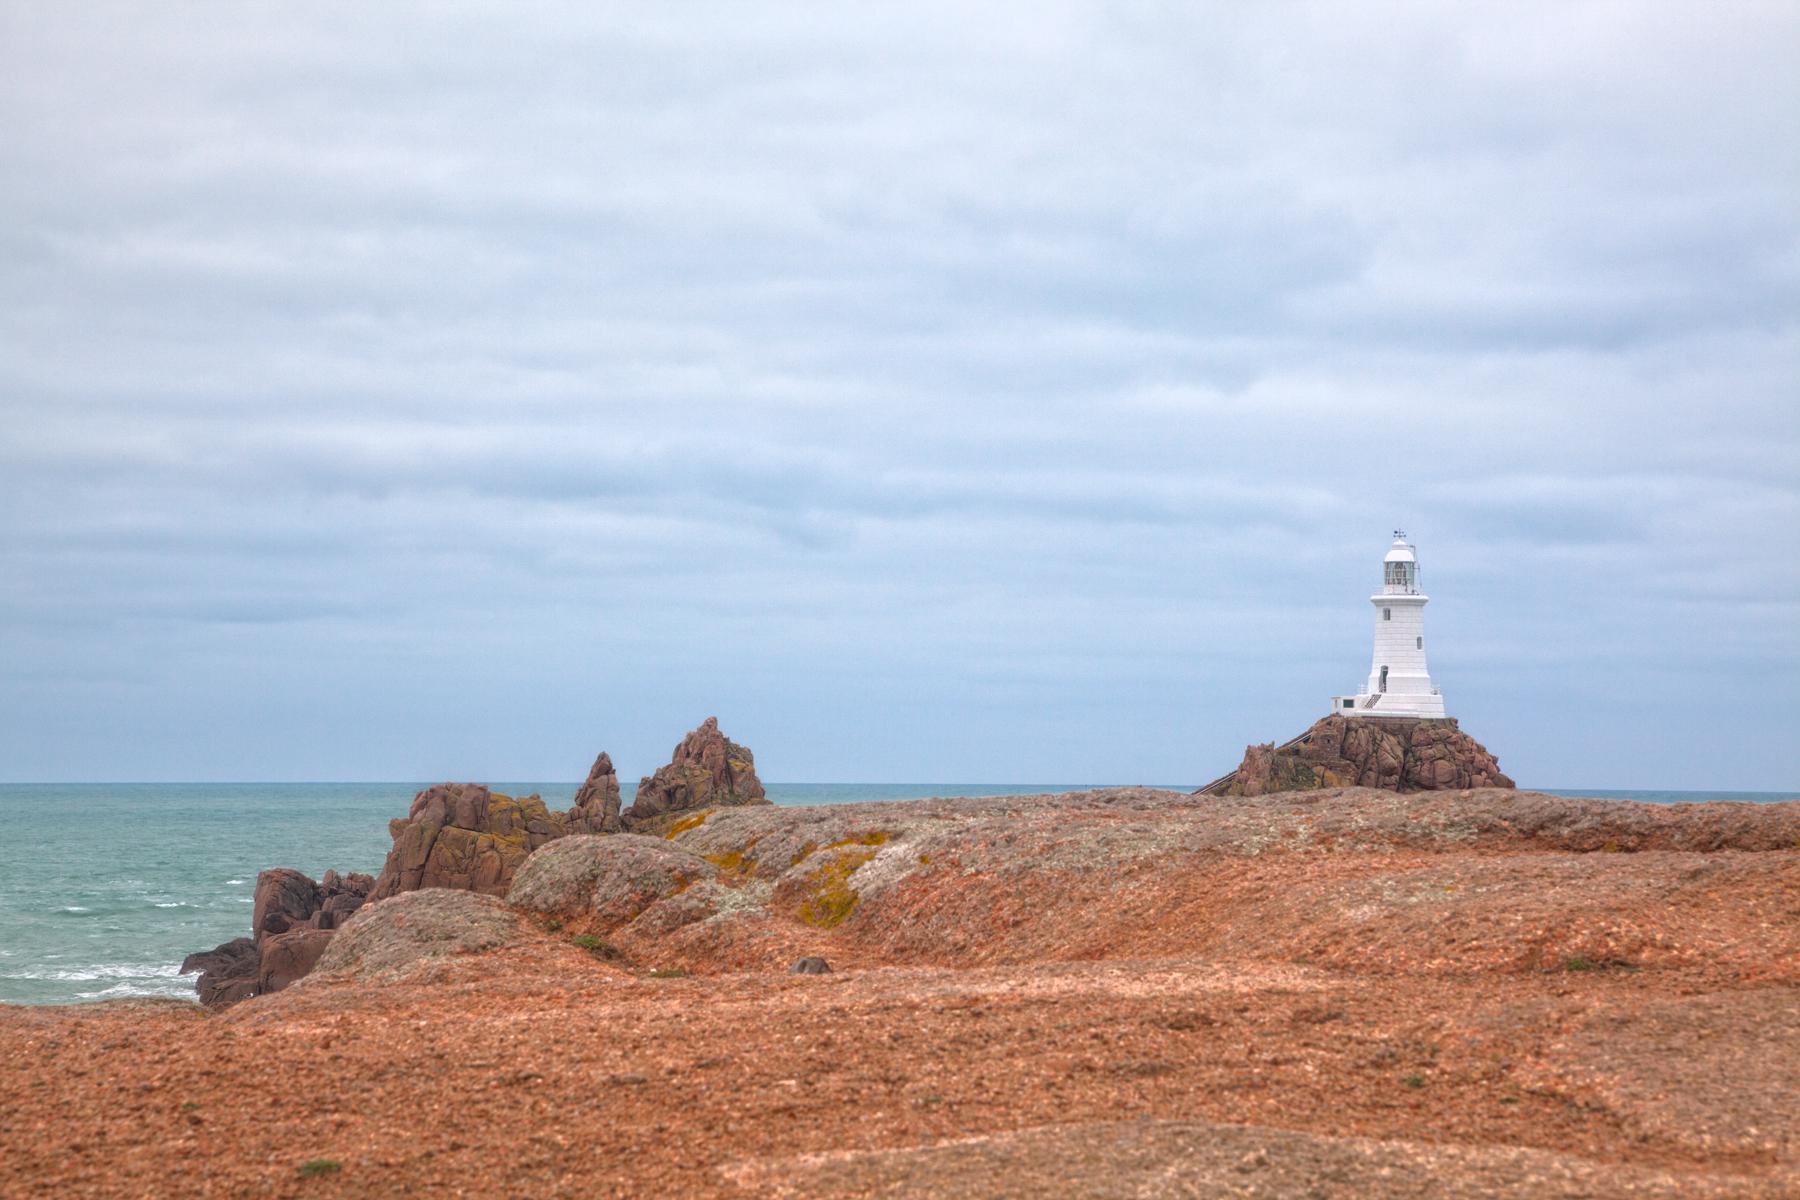 Jersey coastal scenery - hdr photo